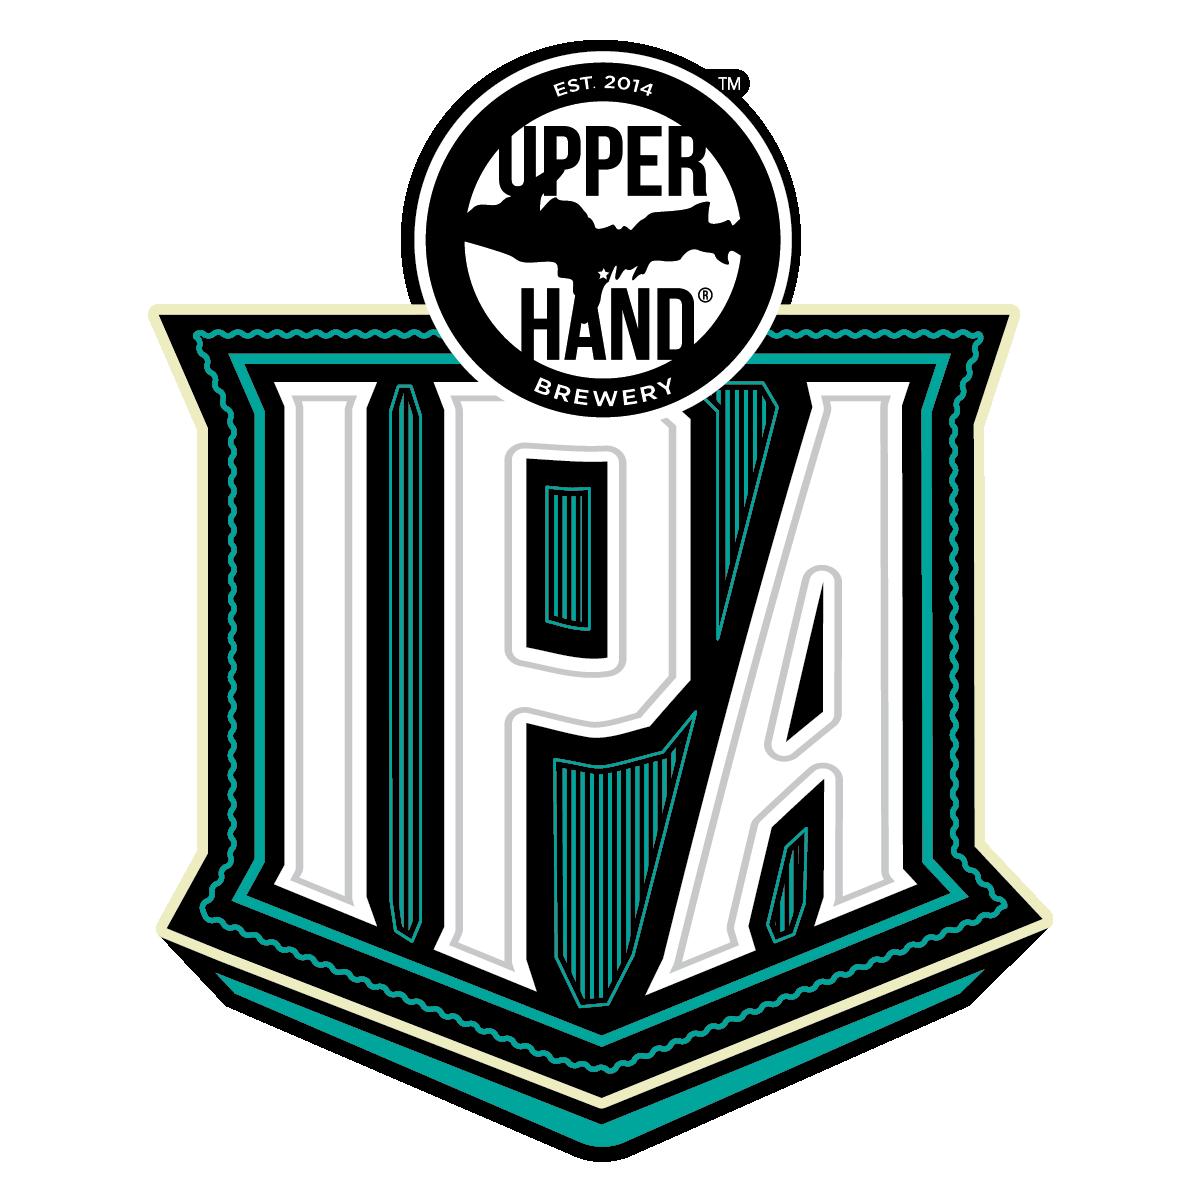 Upper Hand<span class='trade'>®</span> IPA